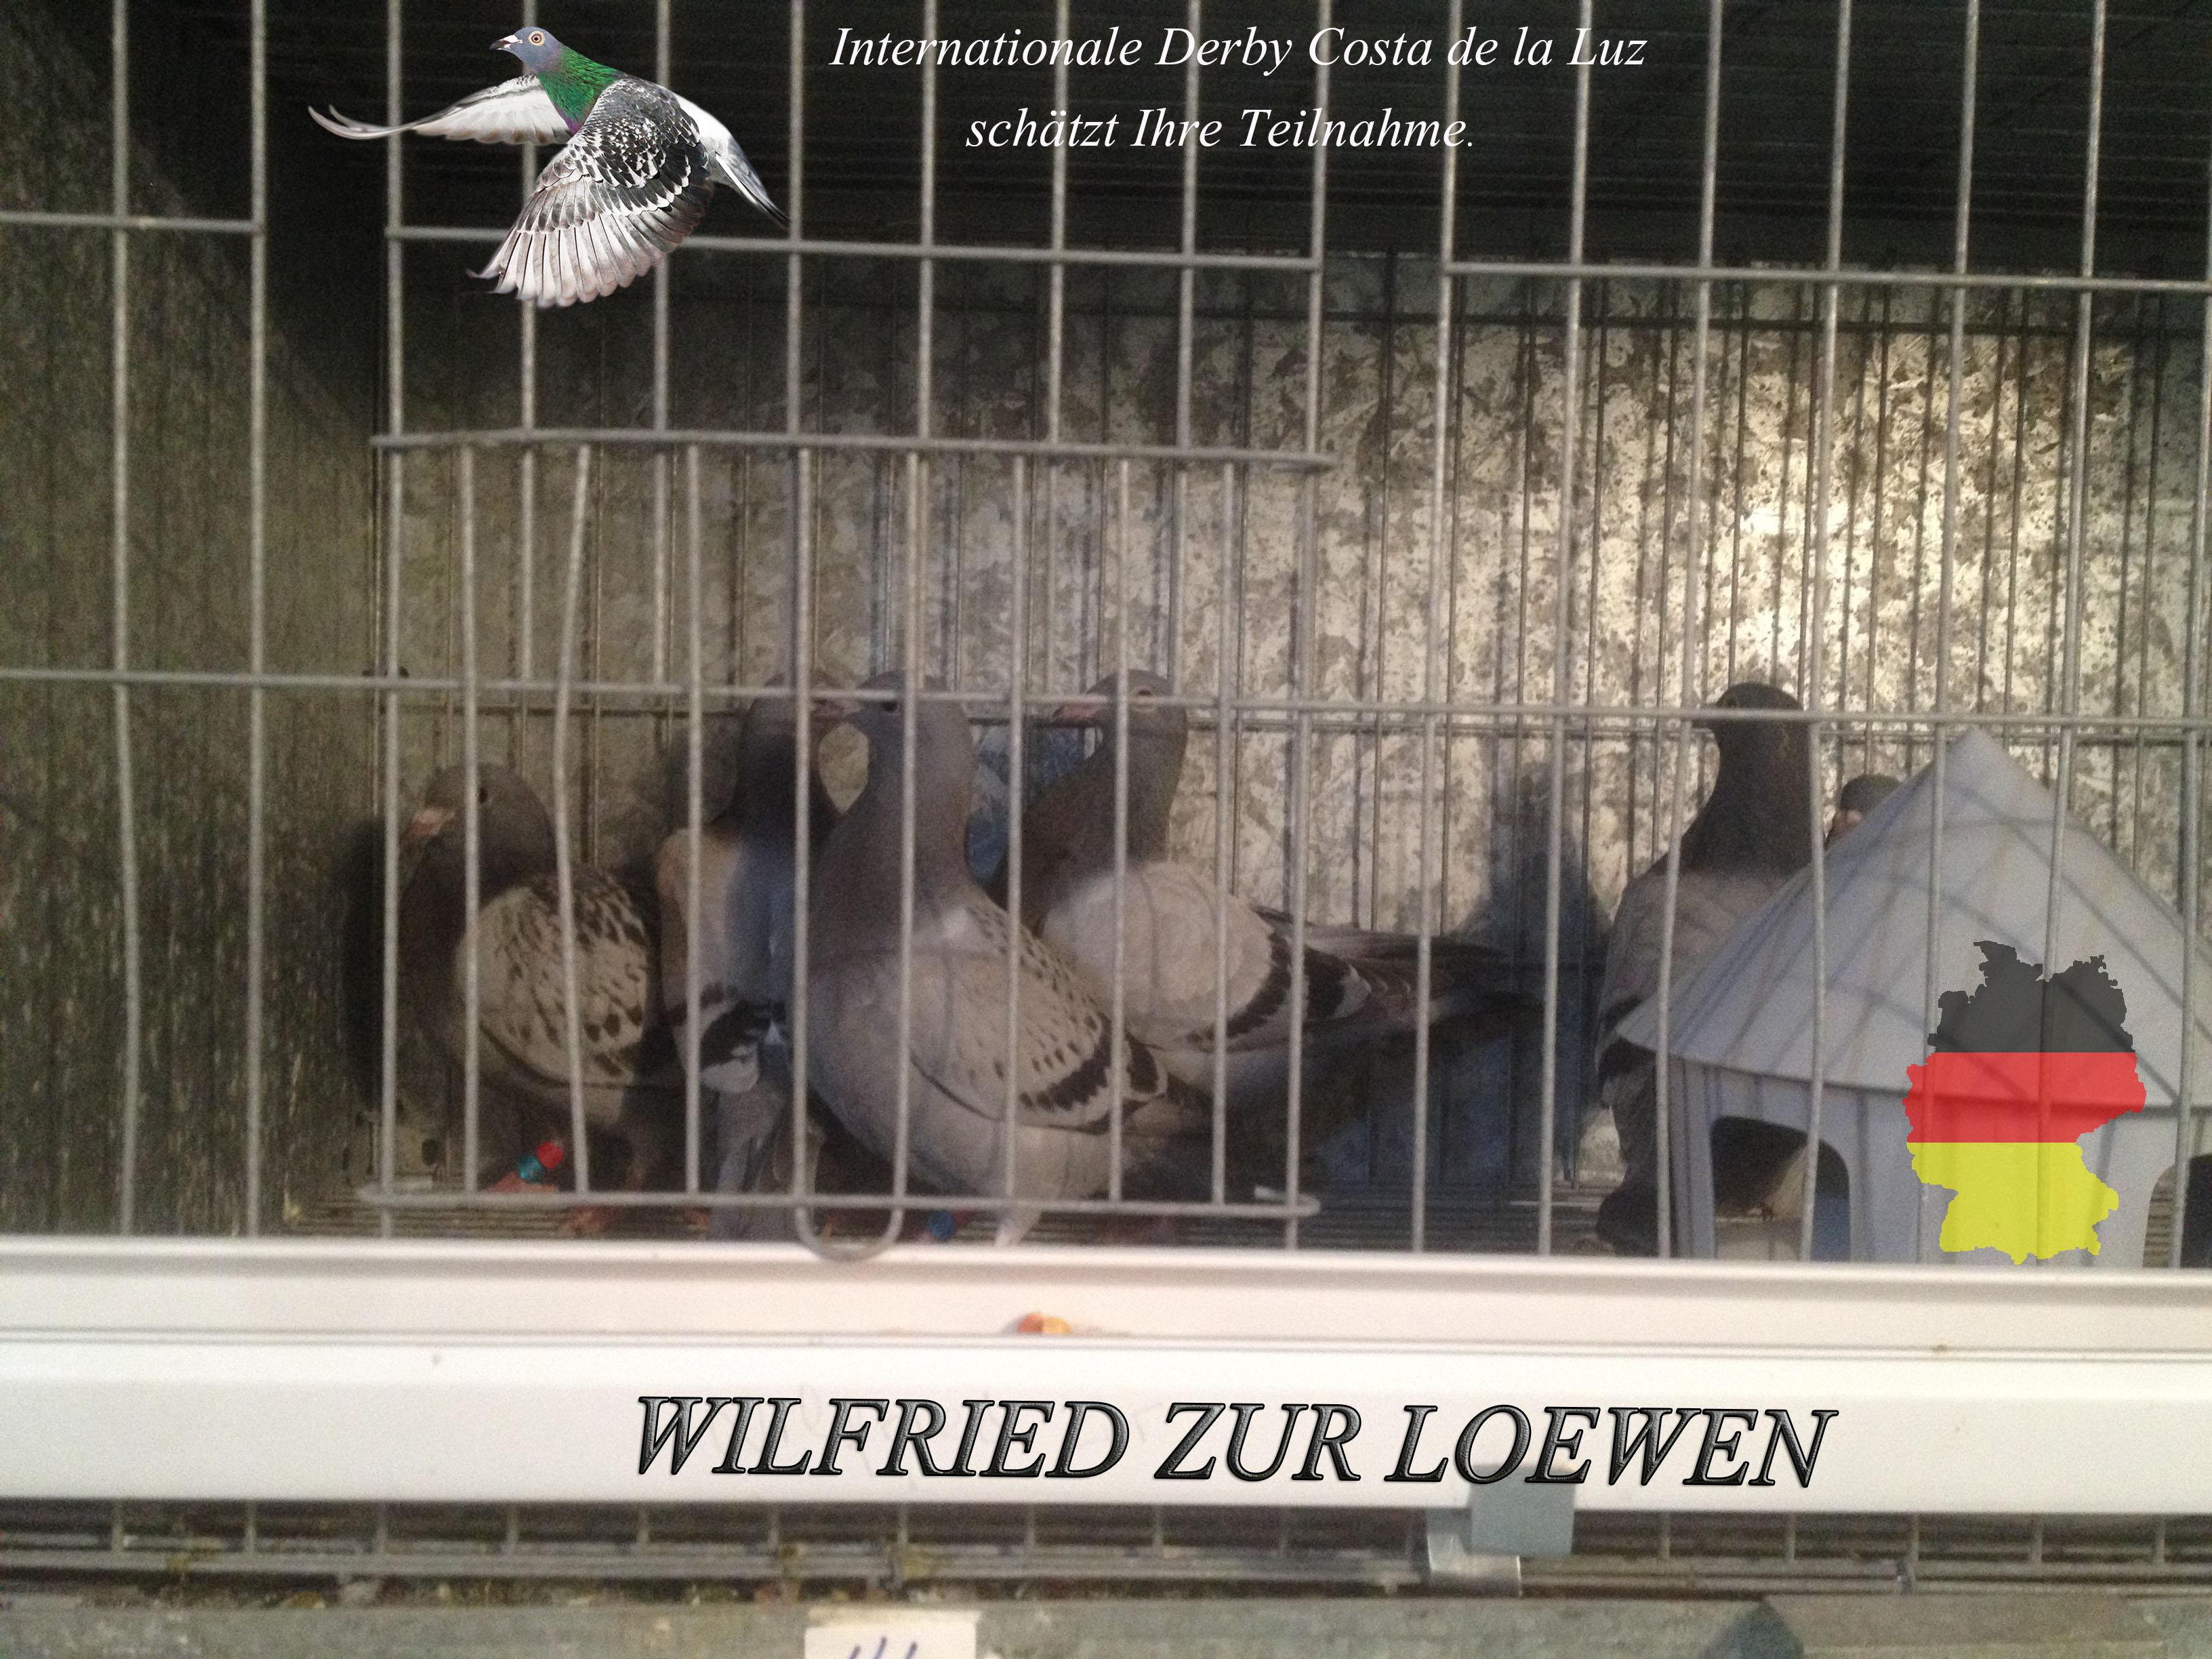 WILFRIED ZUR LOEWEN